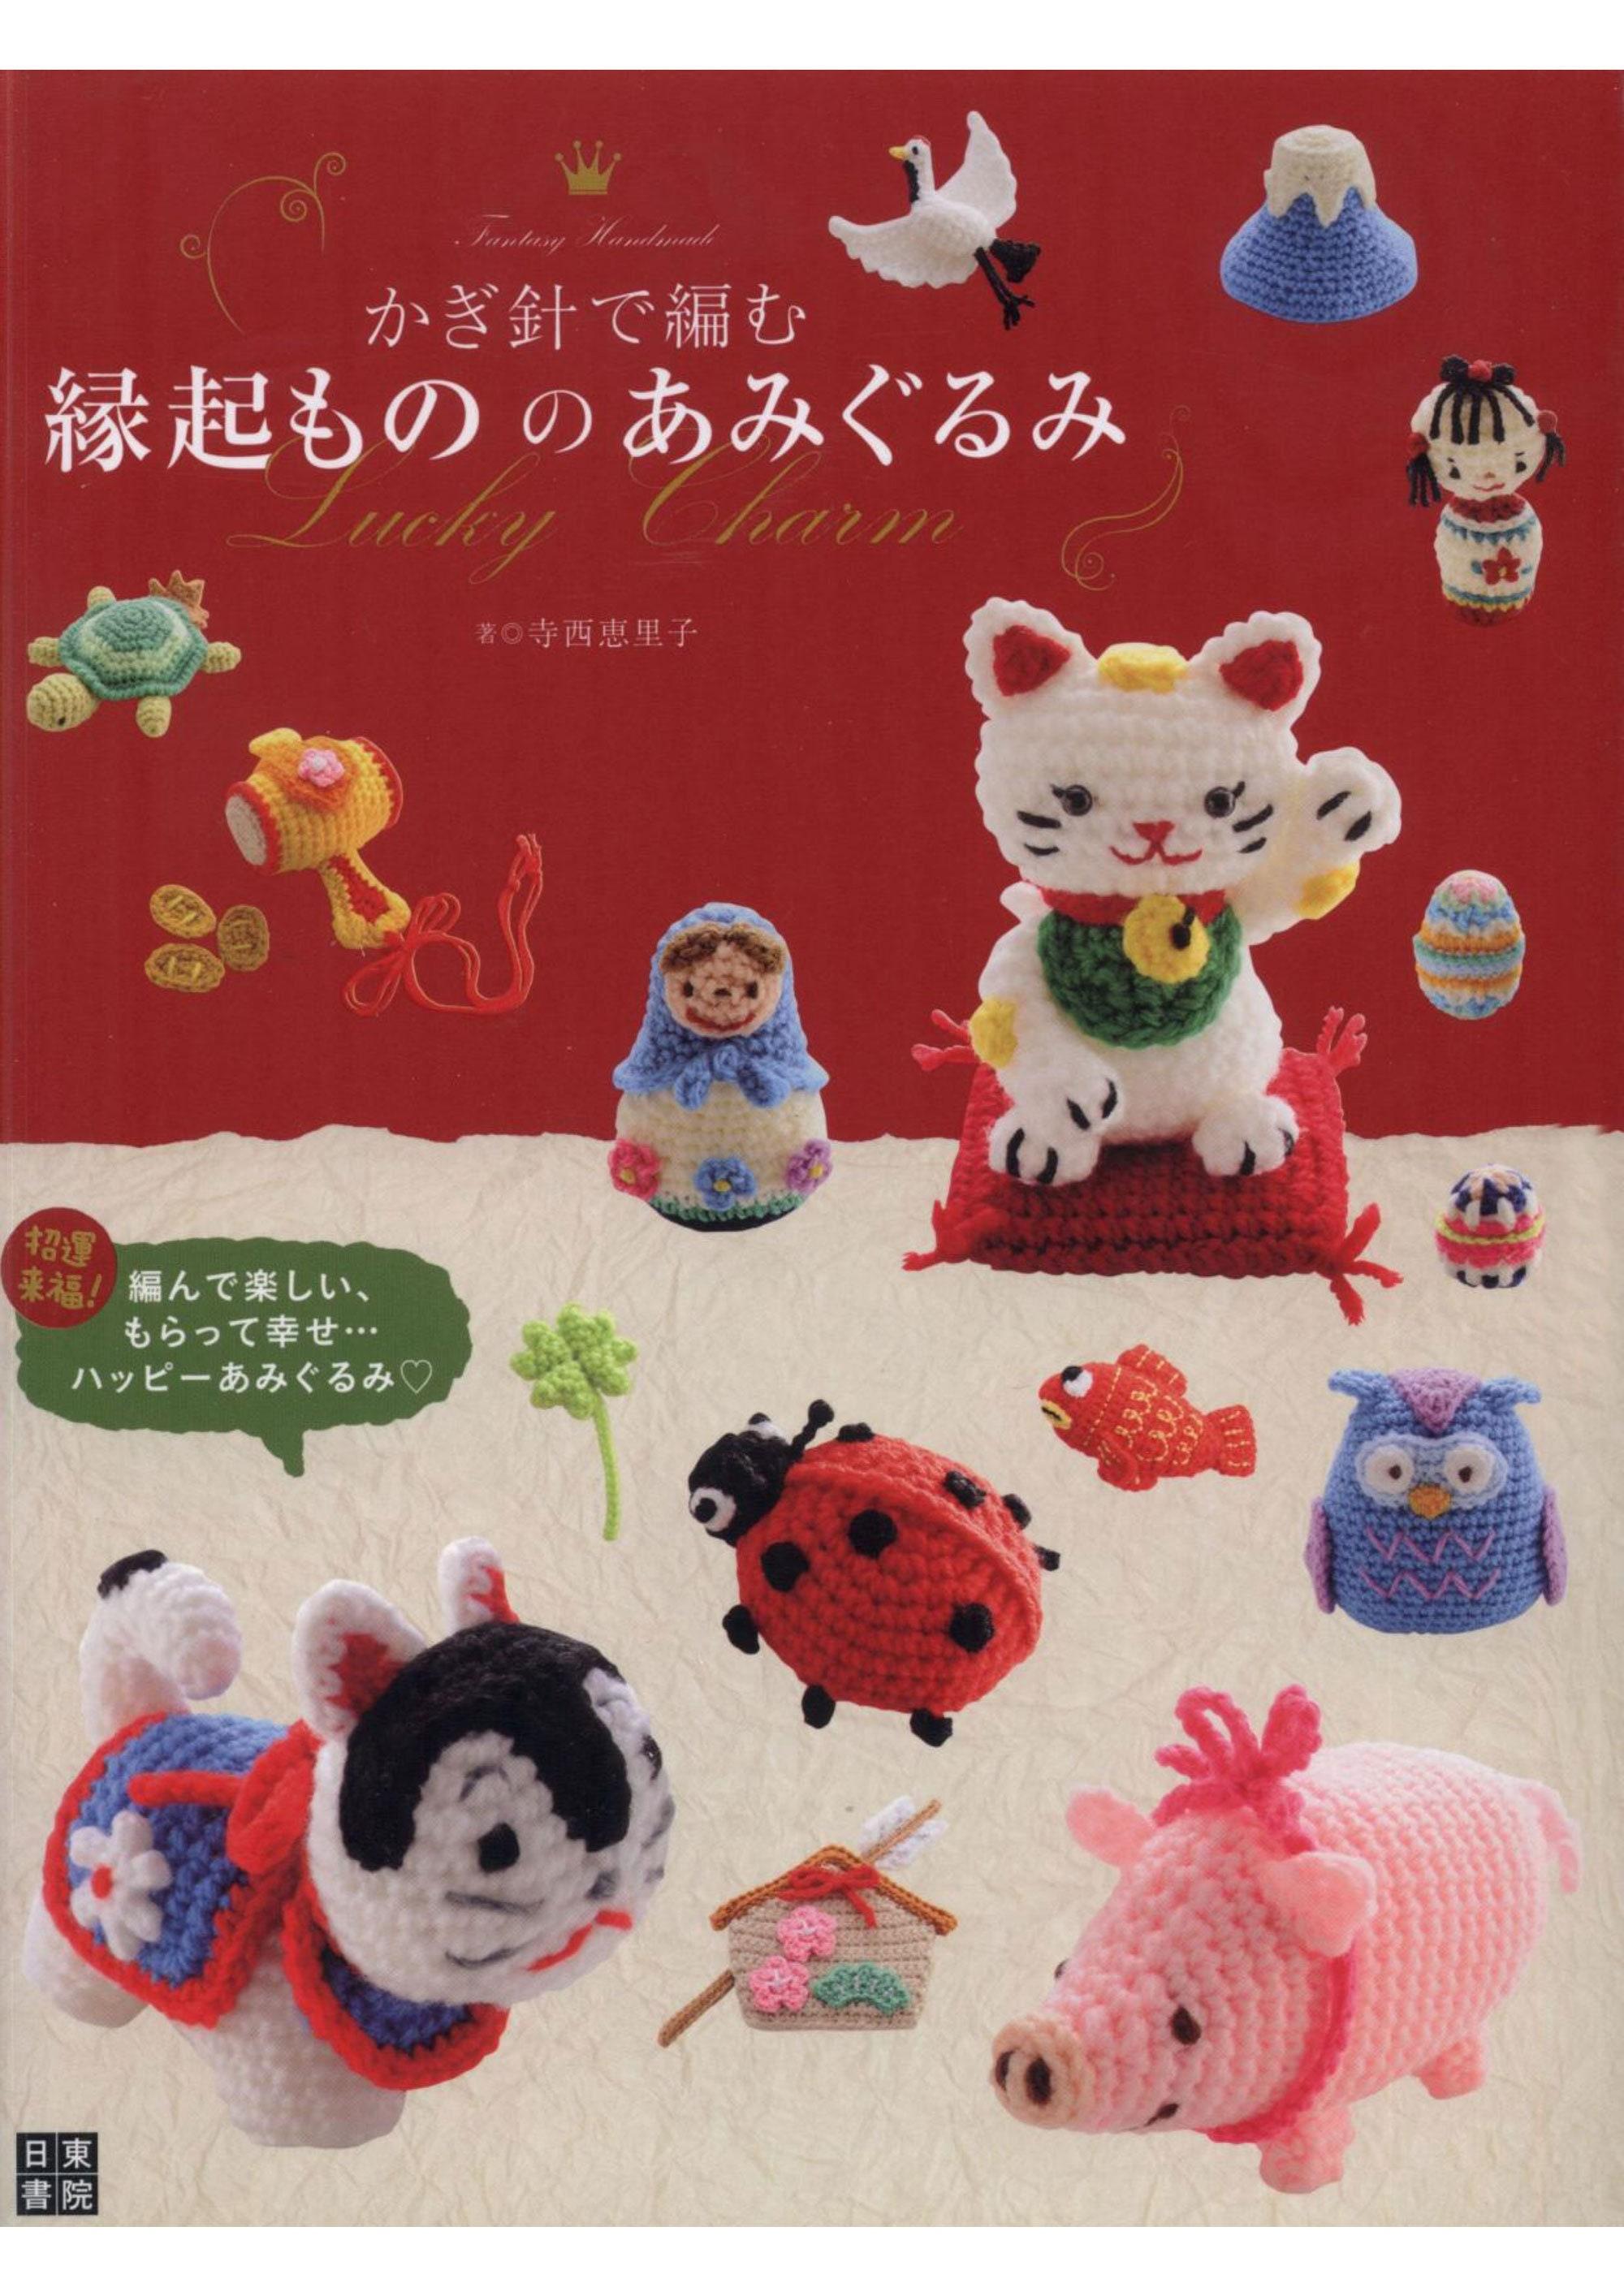 22 Lucky Charm Amigurumi Patternscrochet Patterns Crochet Etsy